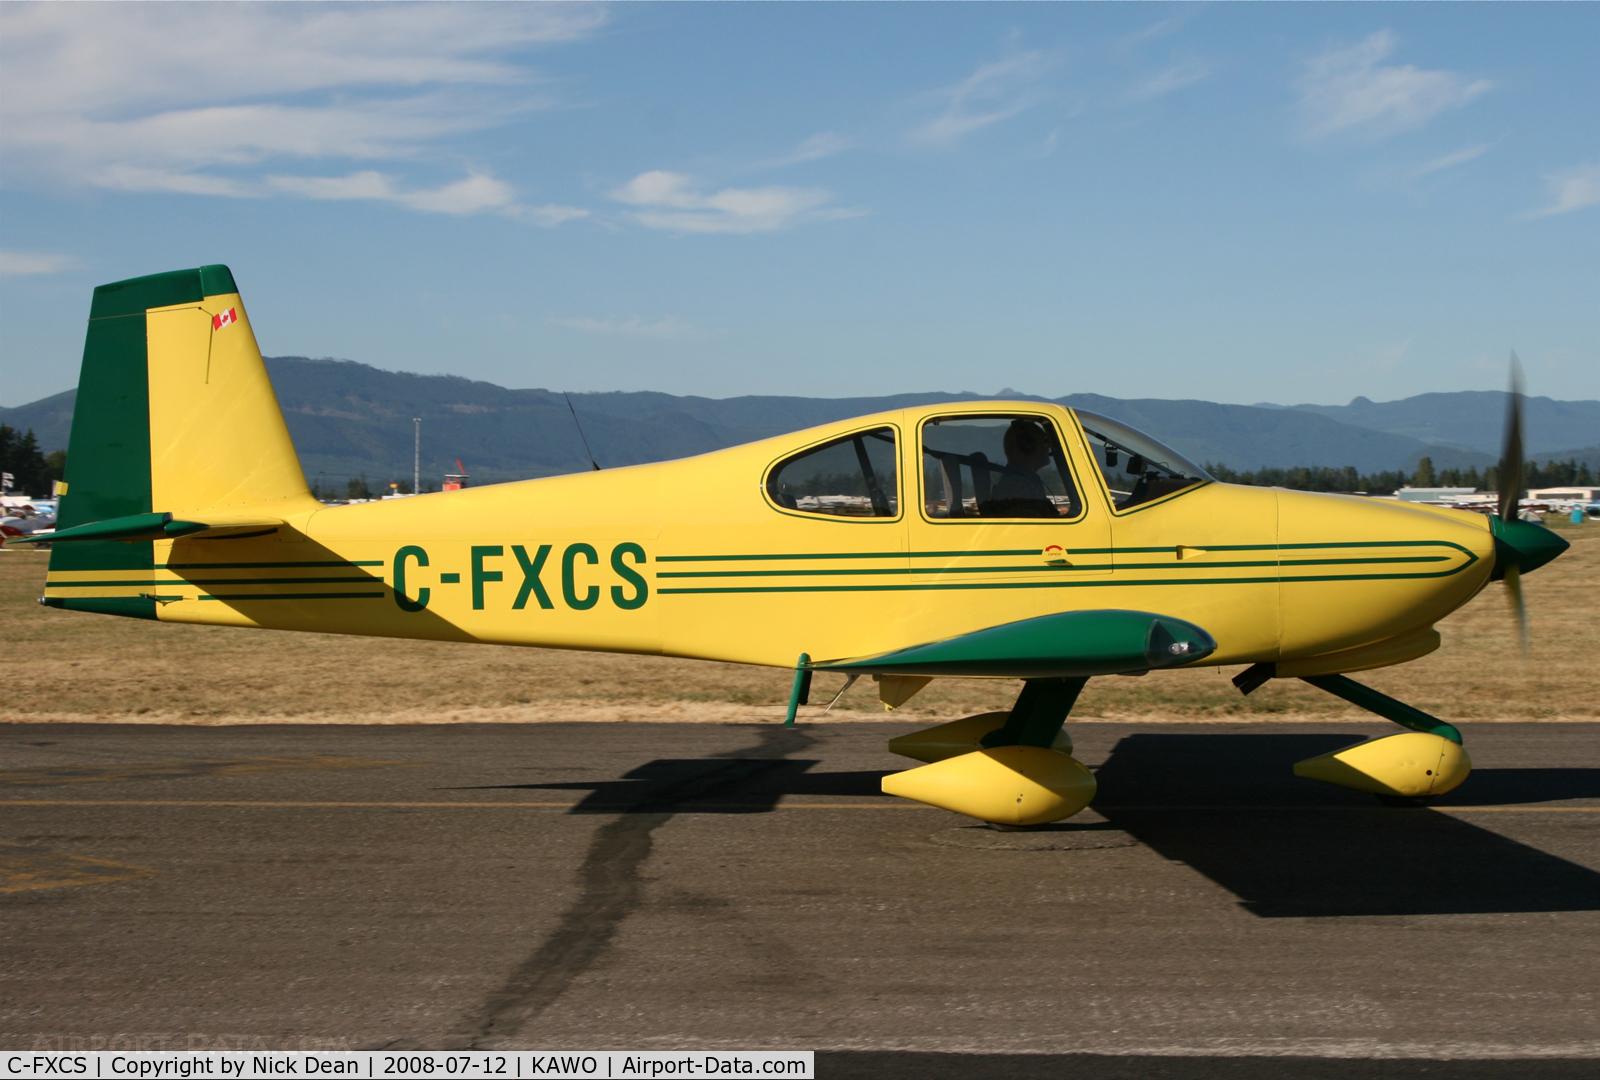 C-FXCS, 2007 Vans RV-10 C/N 40297, Arlington fly in